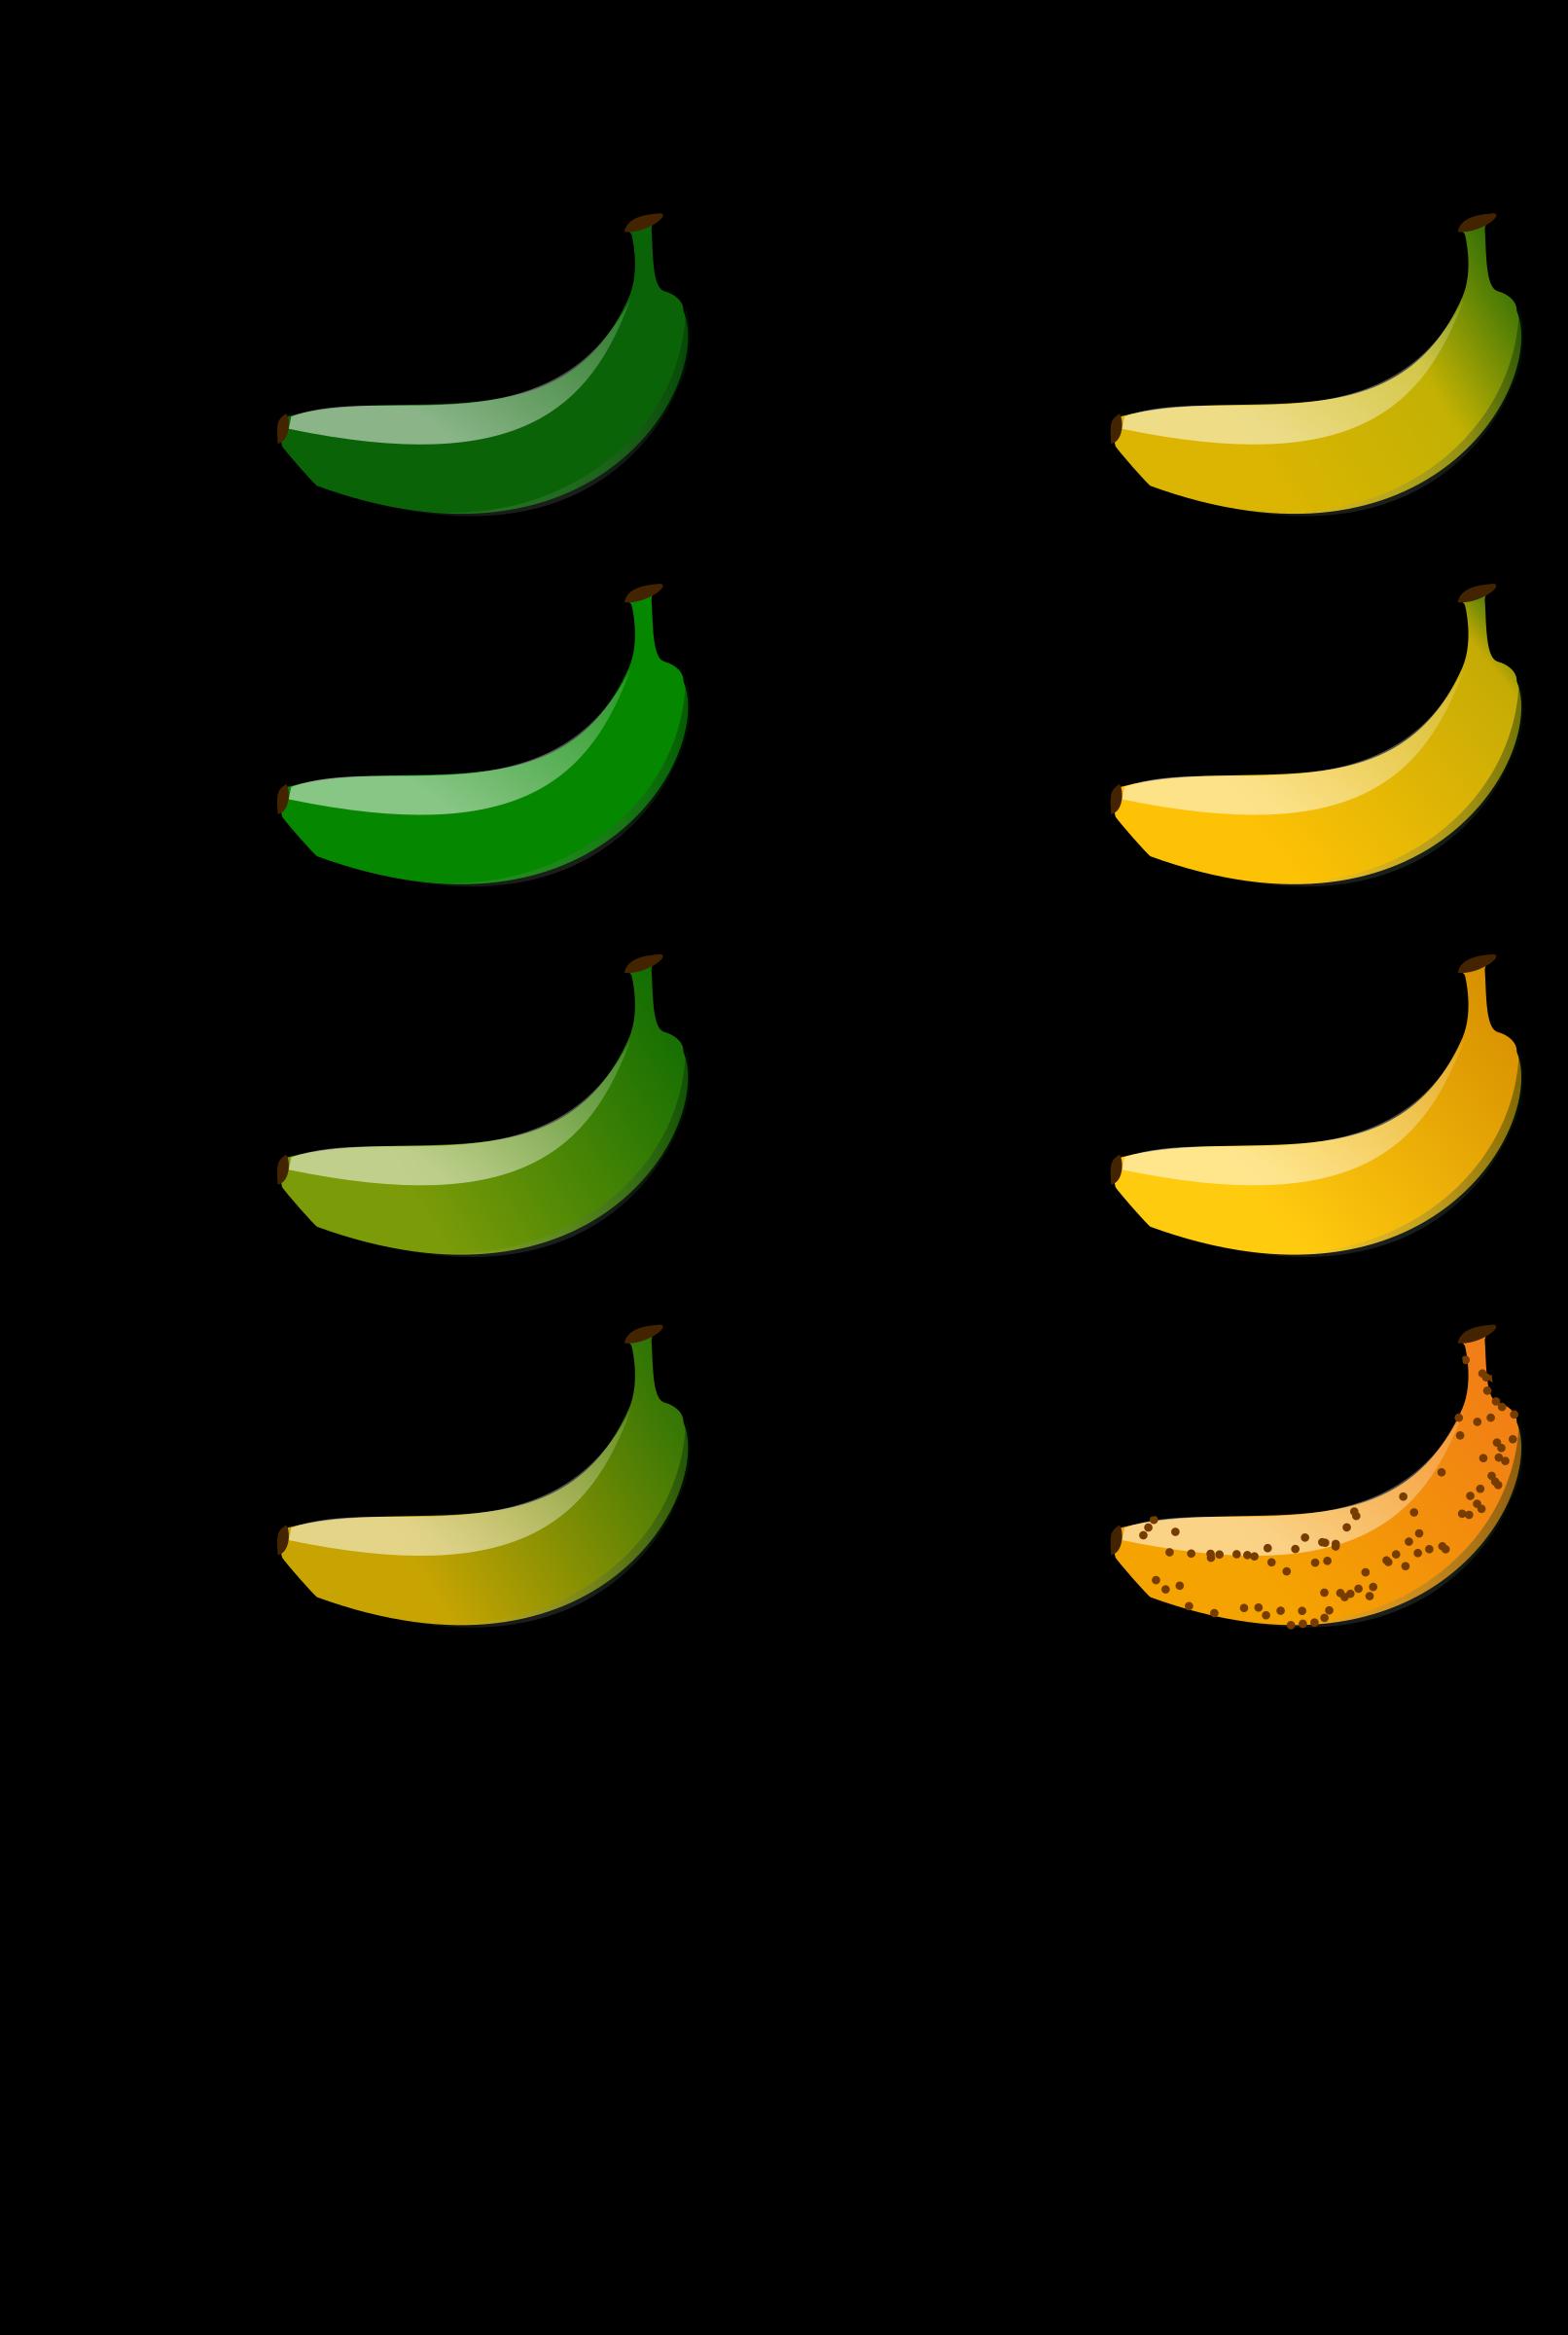 Color clipart color chart. Banana big image png